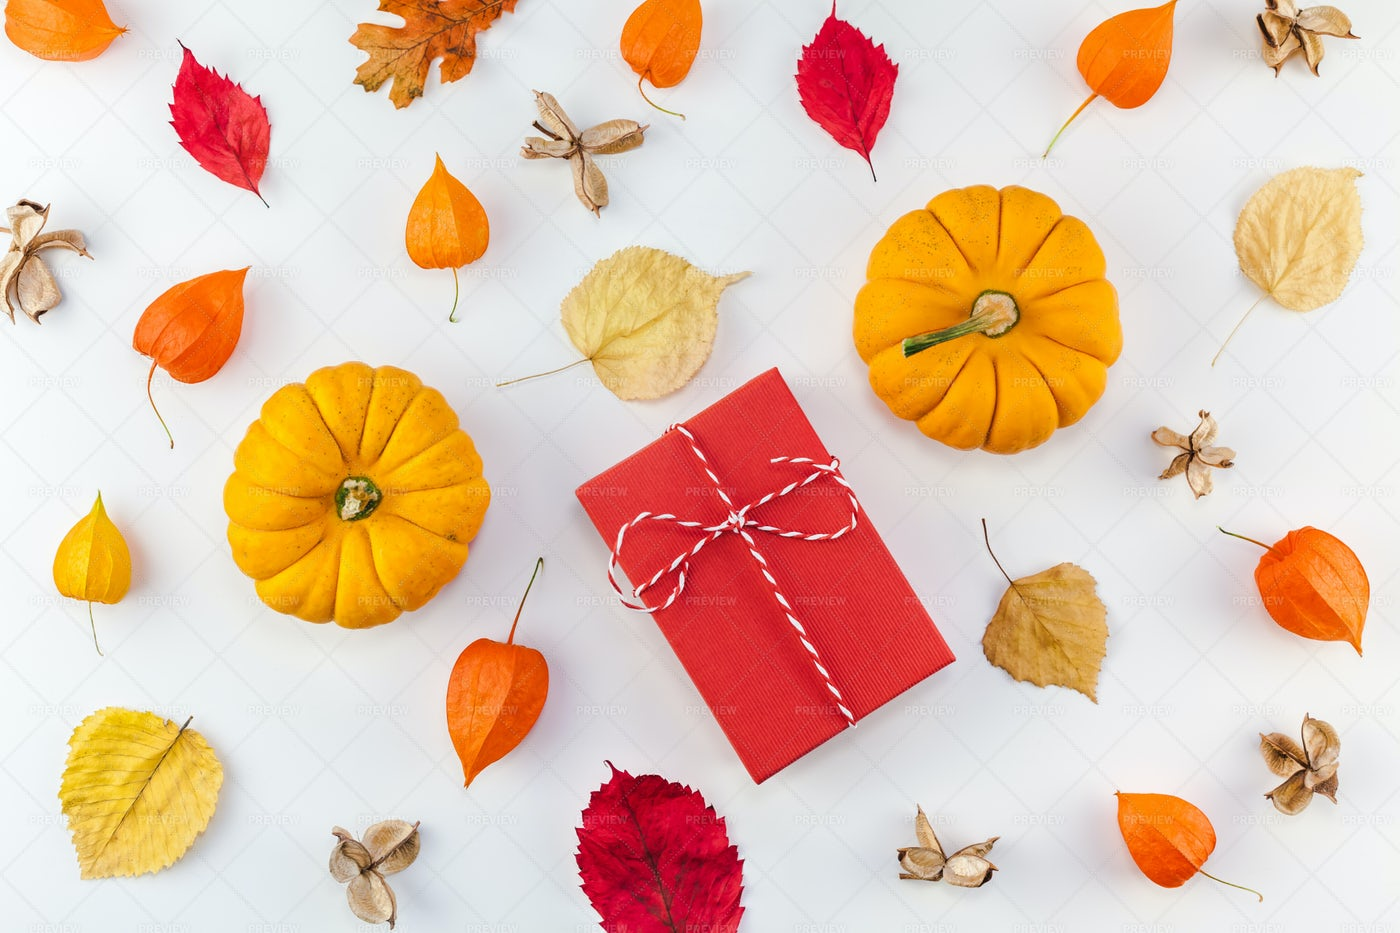 Fall Sale Pattern: Stock Photos